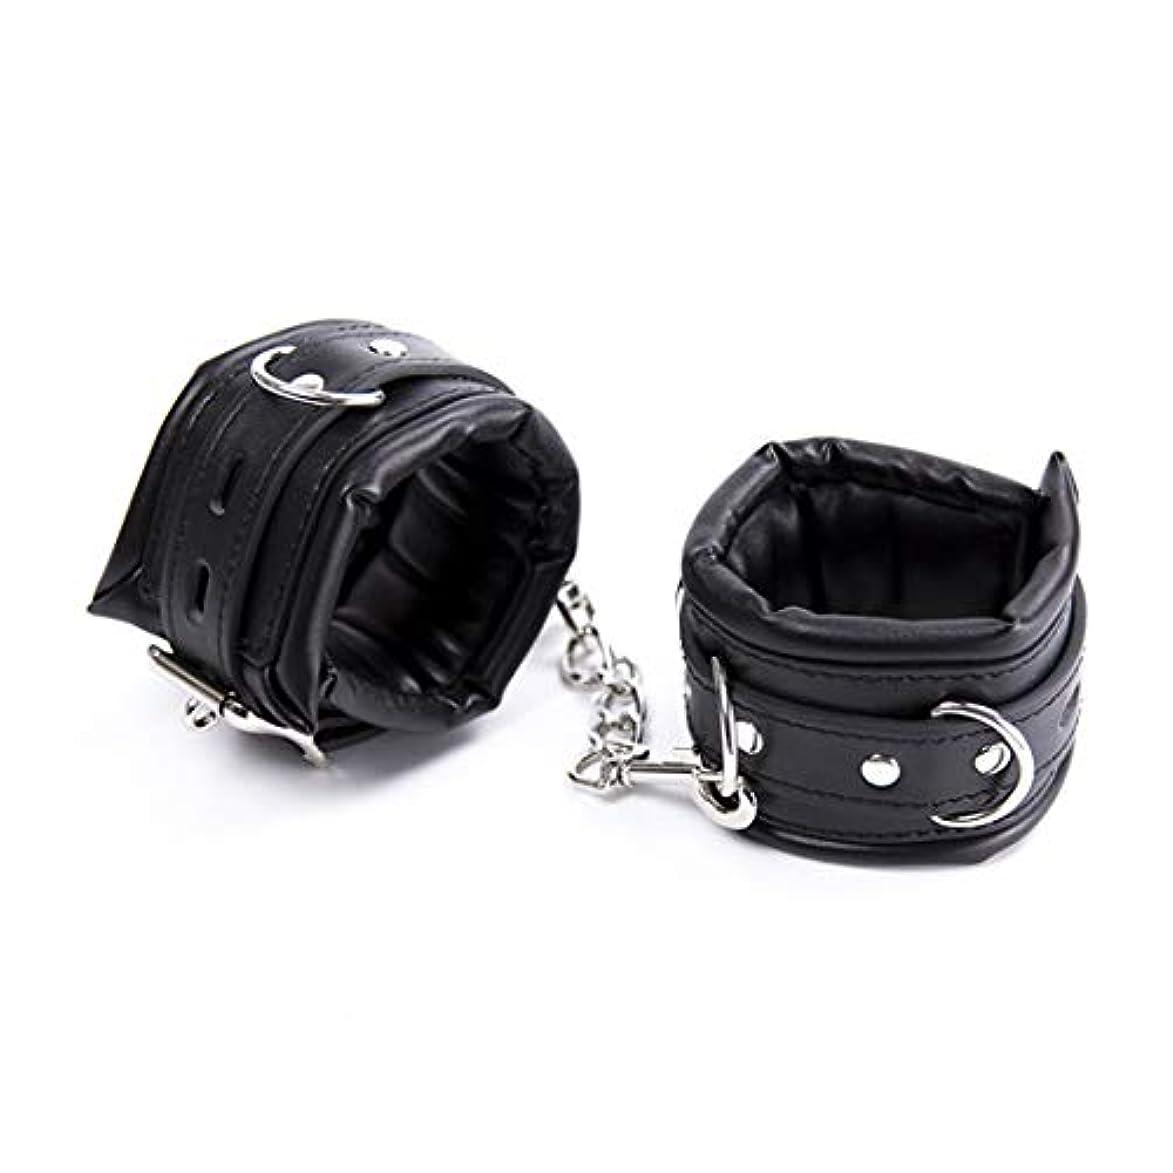 KAKACITY ソフトスポンジレザー手錠縛りボンテージ耐久性調整可能な多機能手錠 (色 : 黒, サイズ : Ankle)